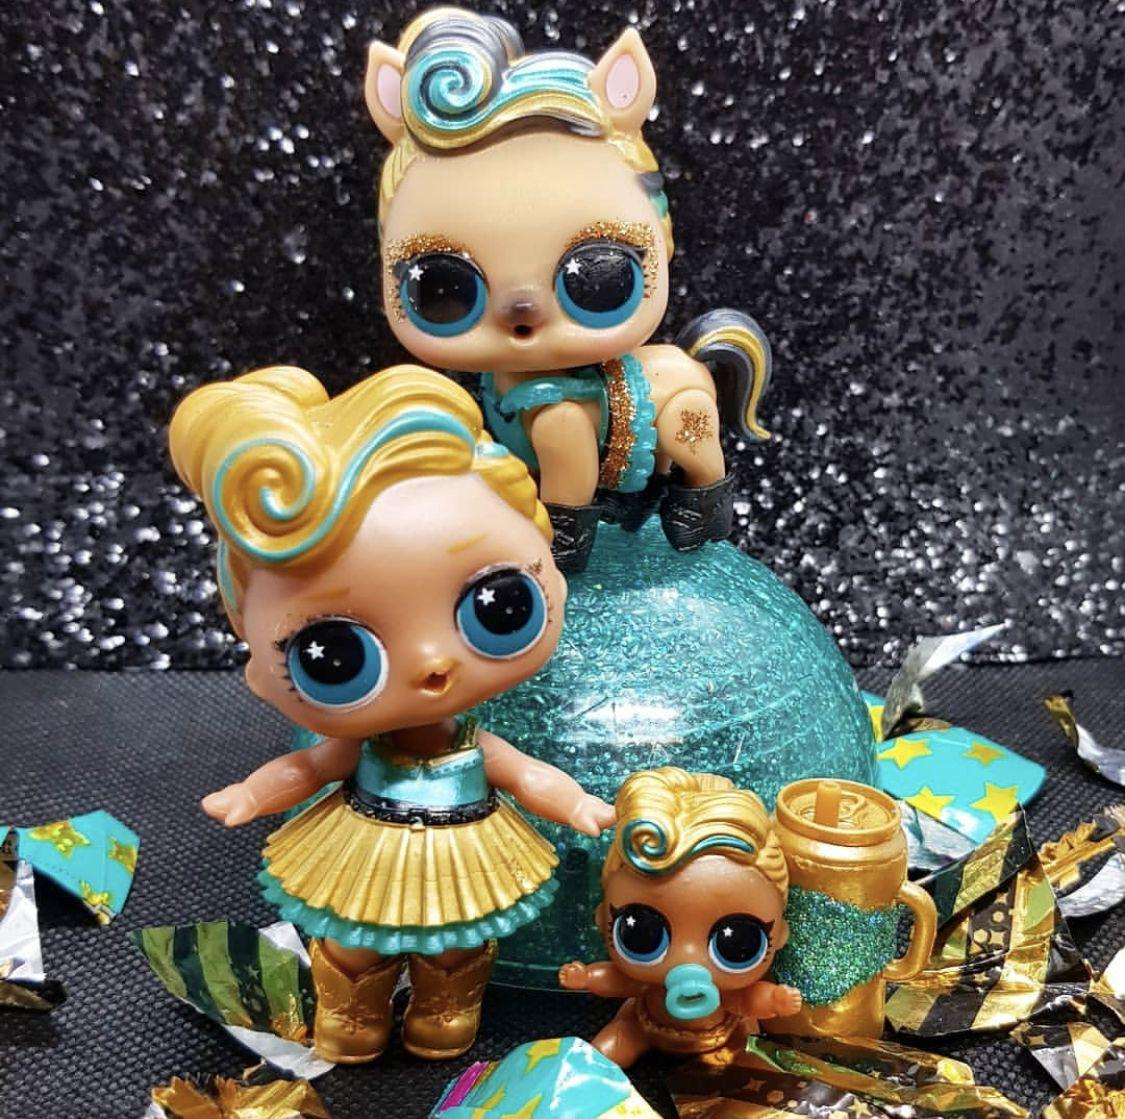 The Luxe Family Lol Surprise Dolls Lol Dolls Lol Dolls